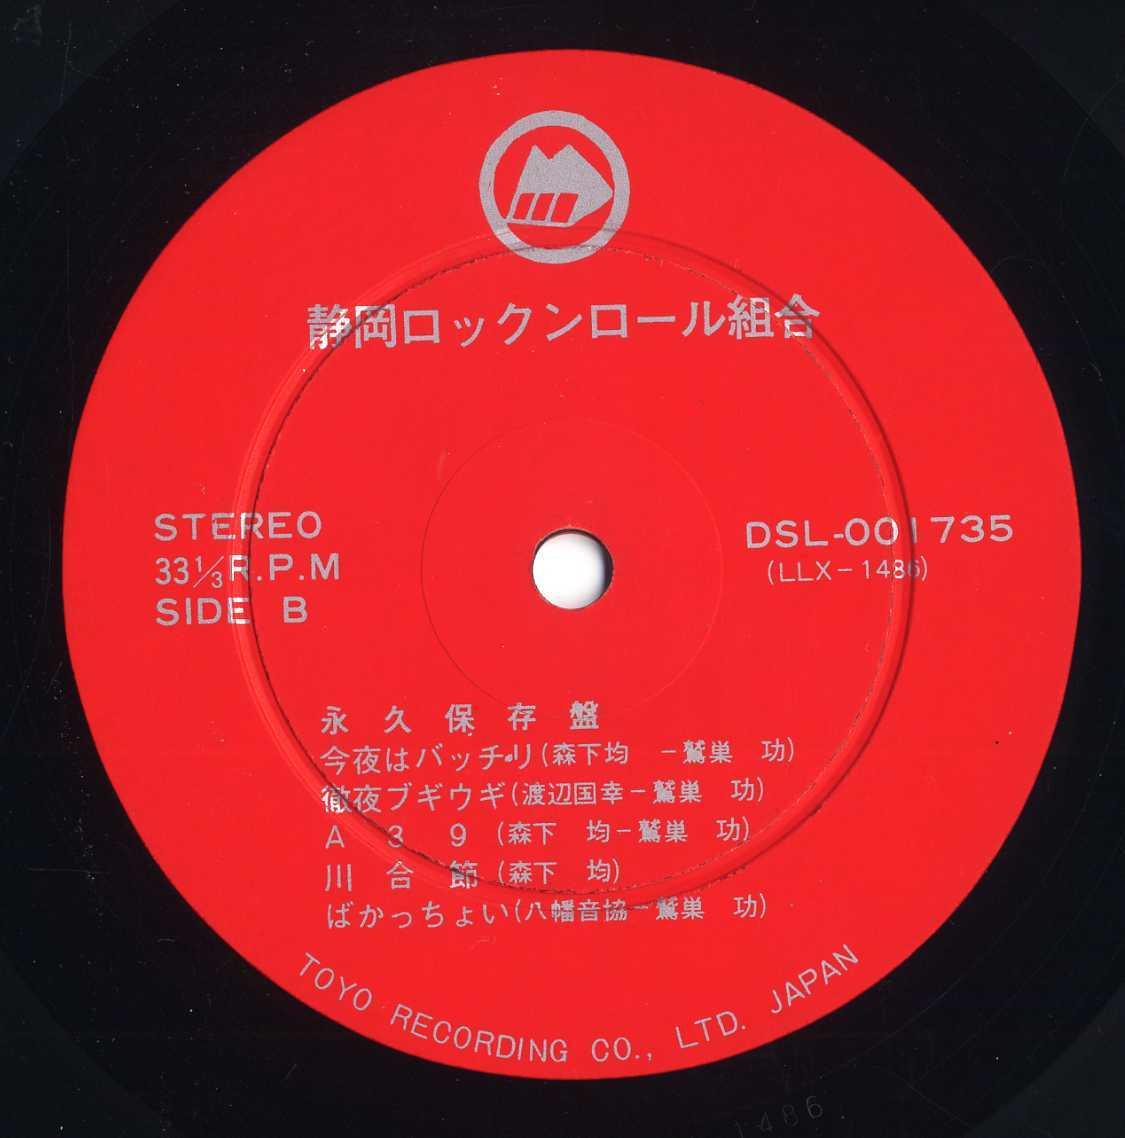 LP★静岡ロックンロール組合/永久保存盤(自主盤'73日本のロック)★Shizuoka Rock'n'roll Kumiai/DSL-001735/PRIVATE/RCサクセション村八分_画像5